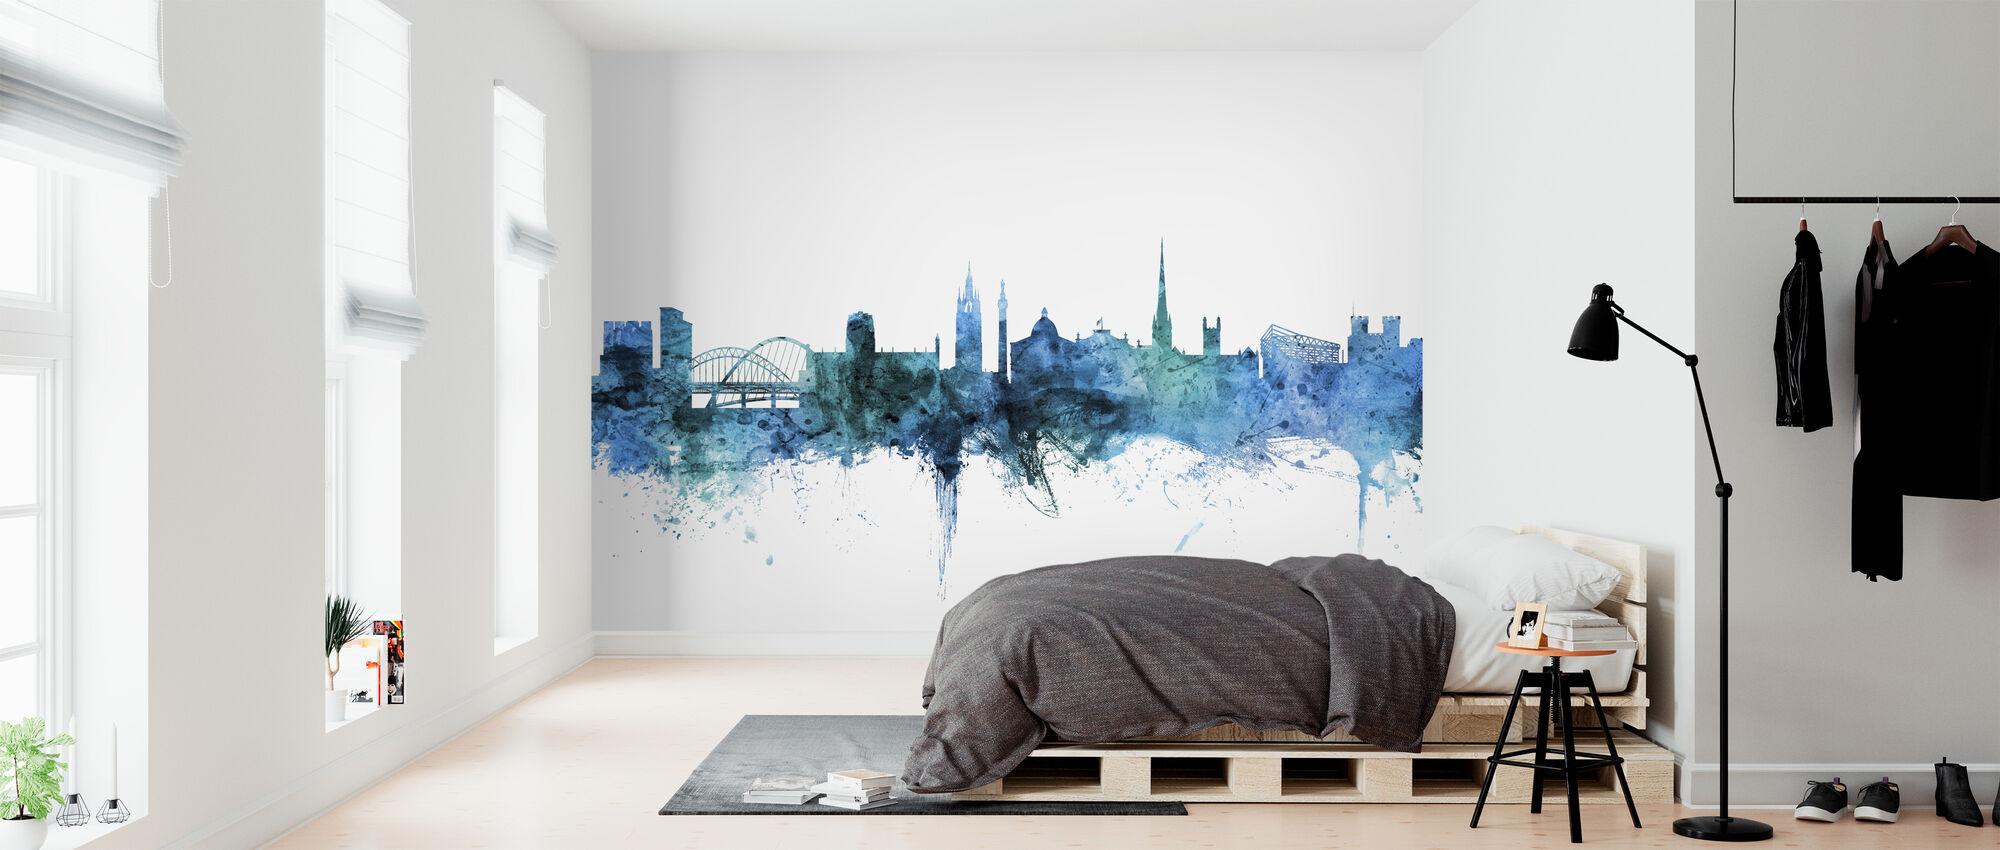 Newcastle England Skyline - Wallpaper - Bedroom